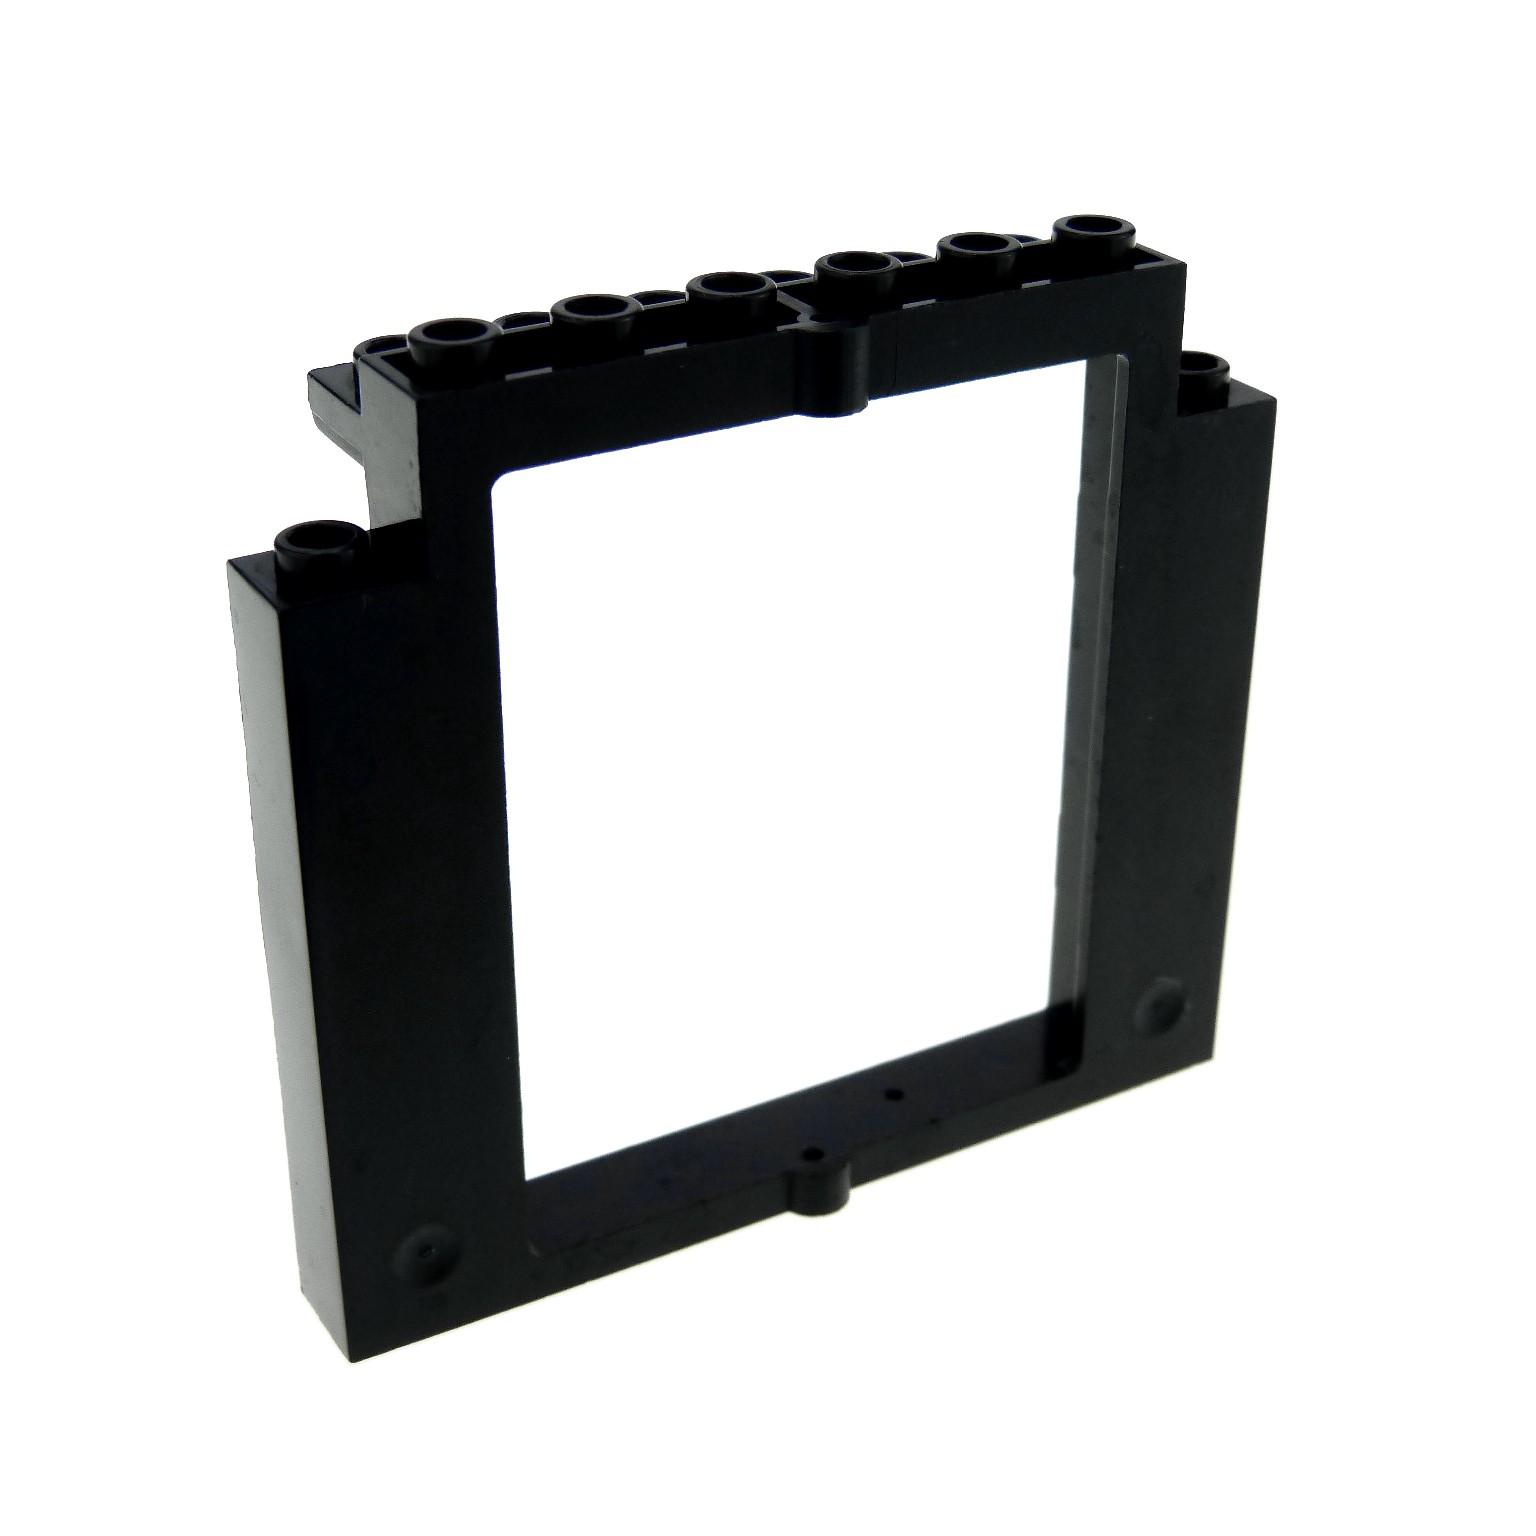 1 x lego system t r rahmen schwarz 2x8x6 castle dreht r burg fenster rahmen ohne boden. Black Bedroom Furniture Sets. Home Design Ideas